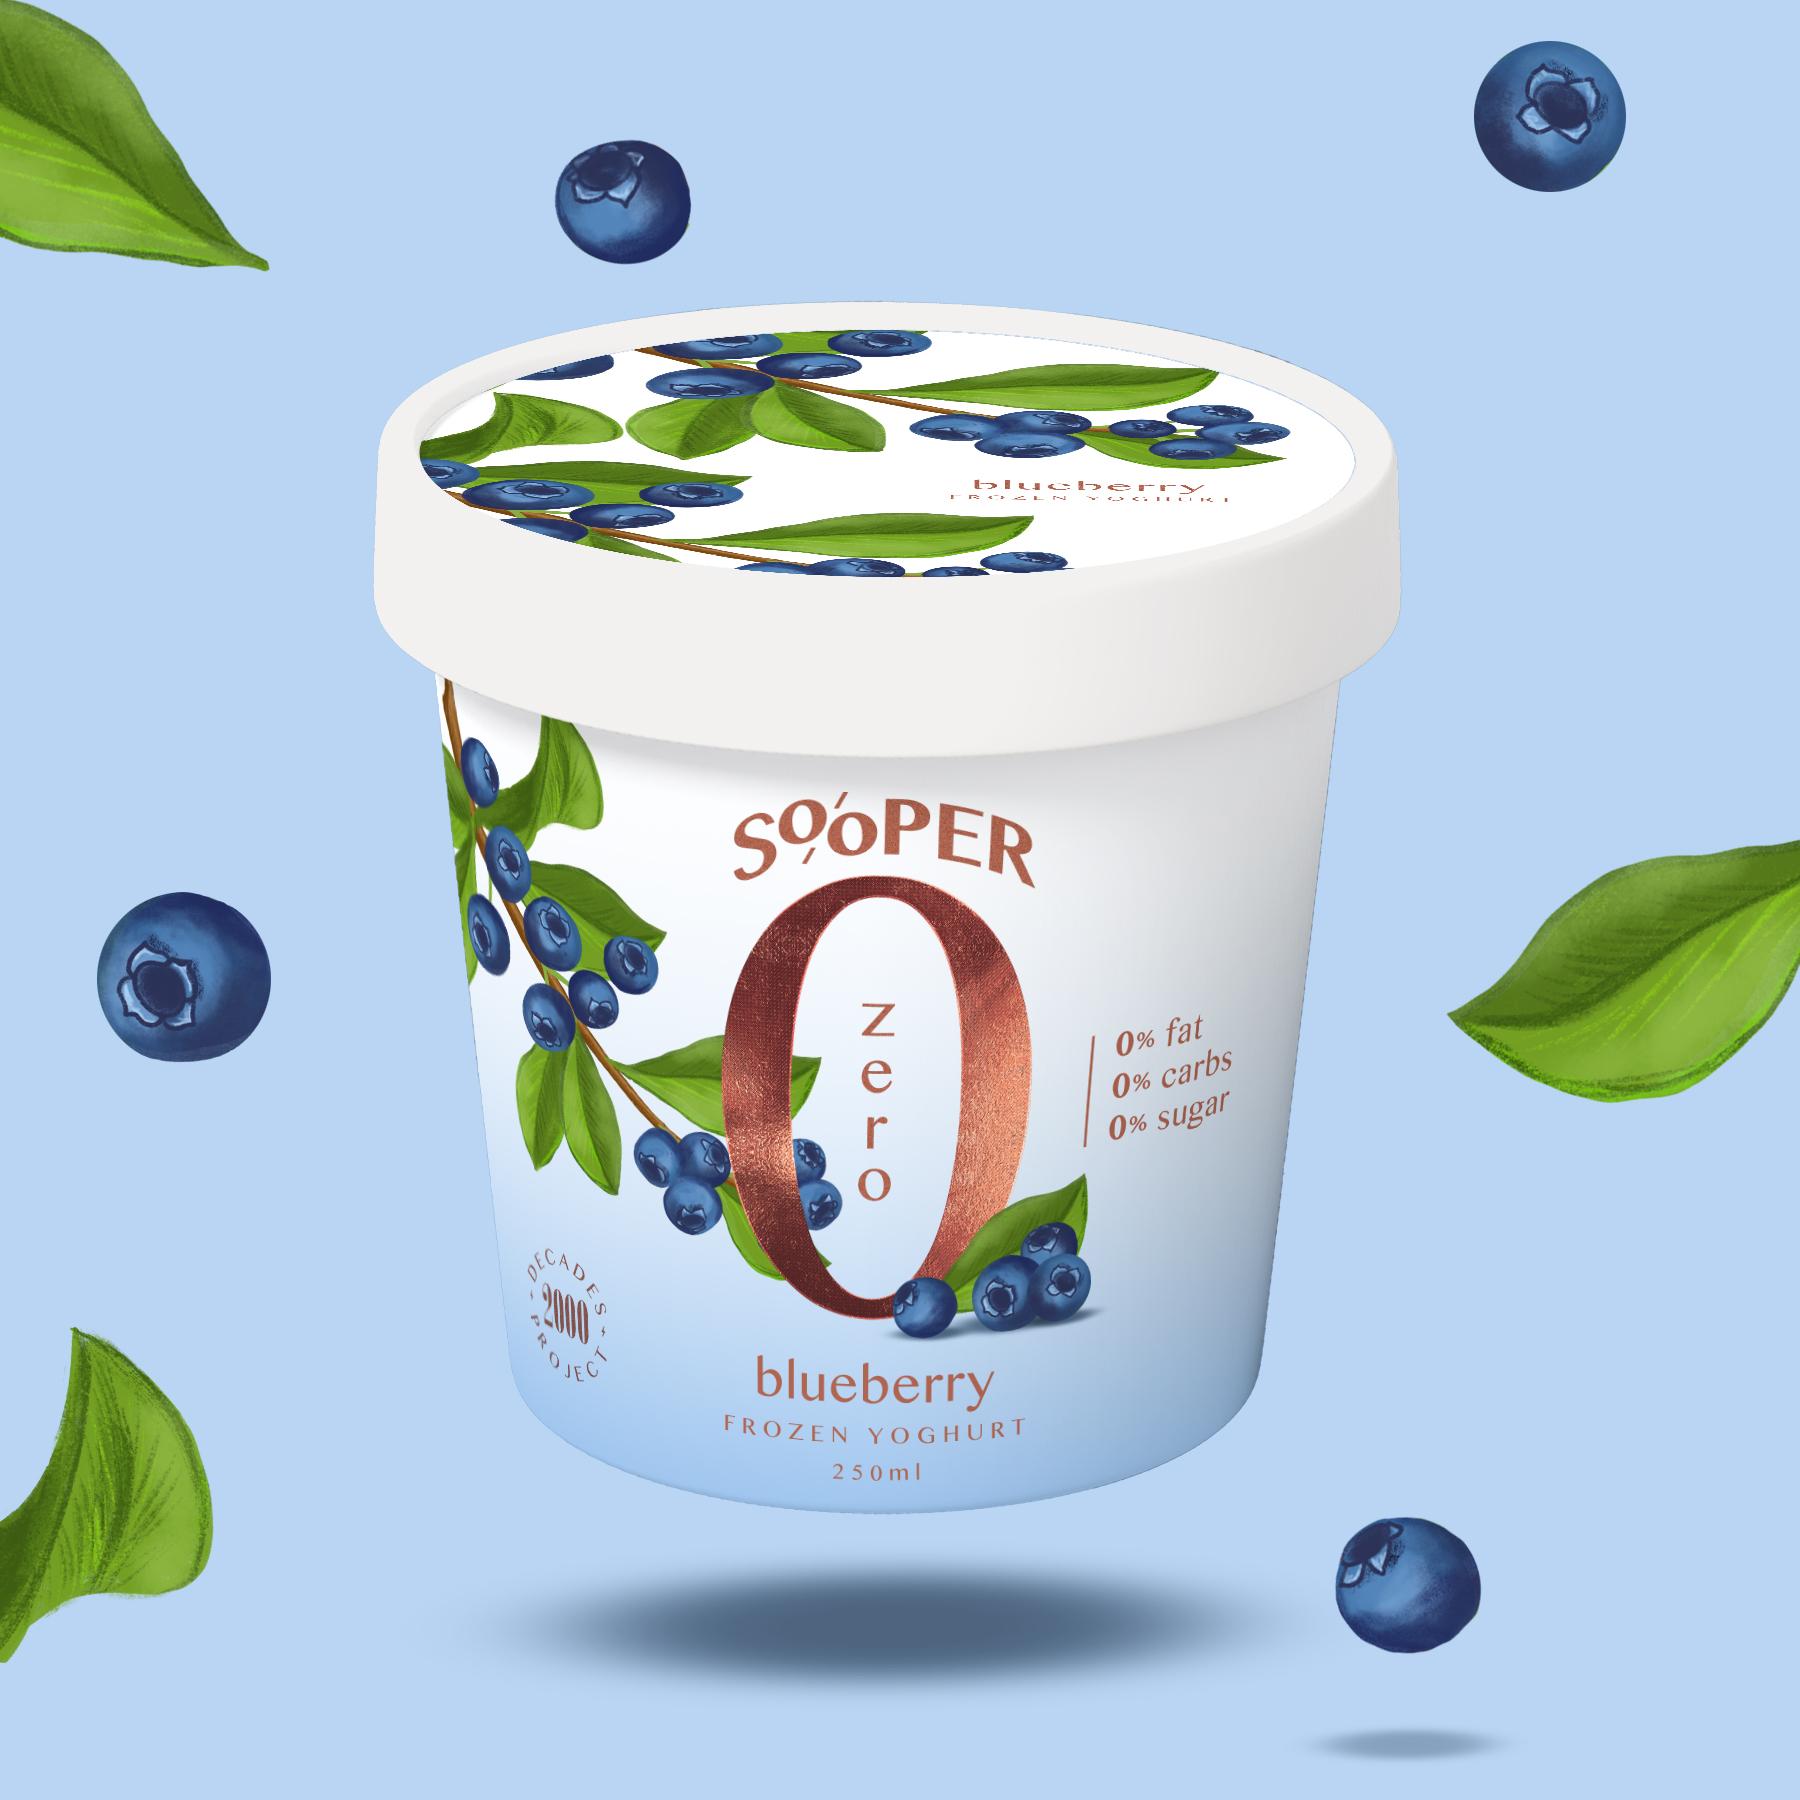 01_2000_SpasmStudio_yoghurt_blueberry_pack